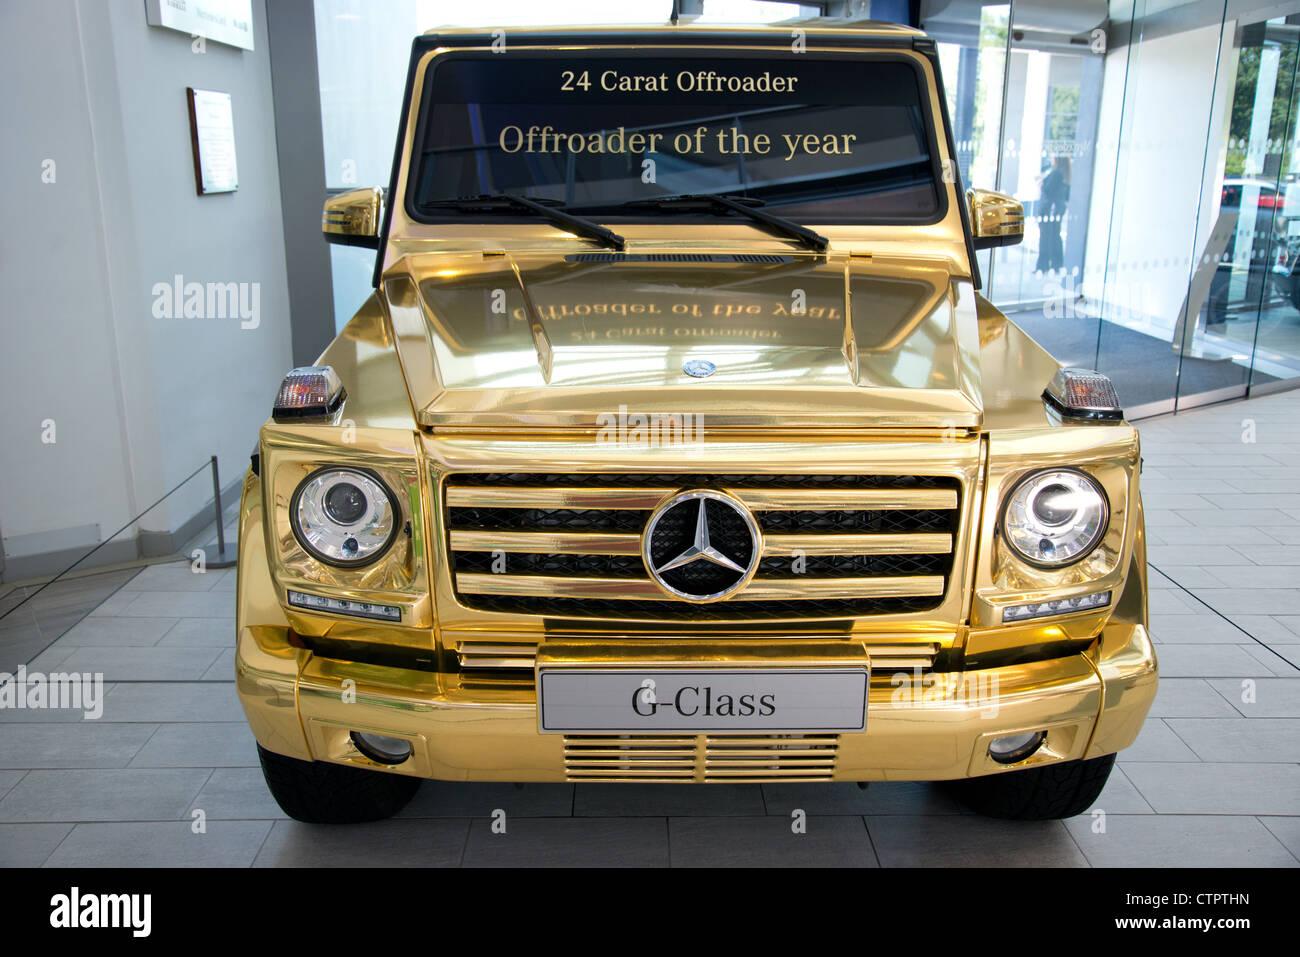 24 carat mercedes offroader car displayed in mercedes benz for Mercedes benz brooklands